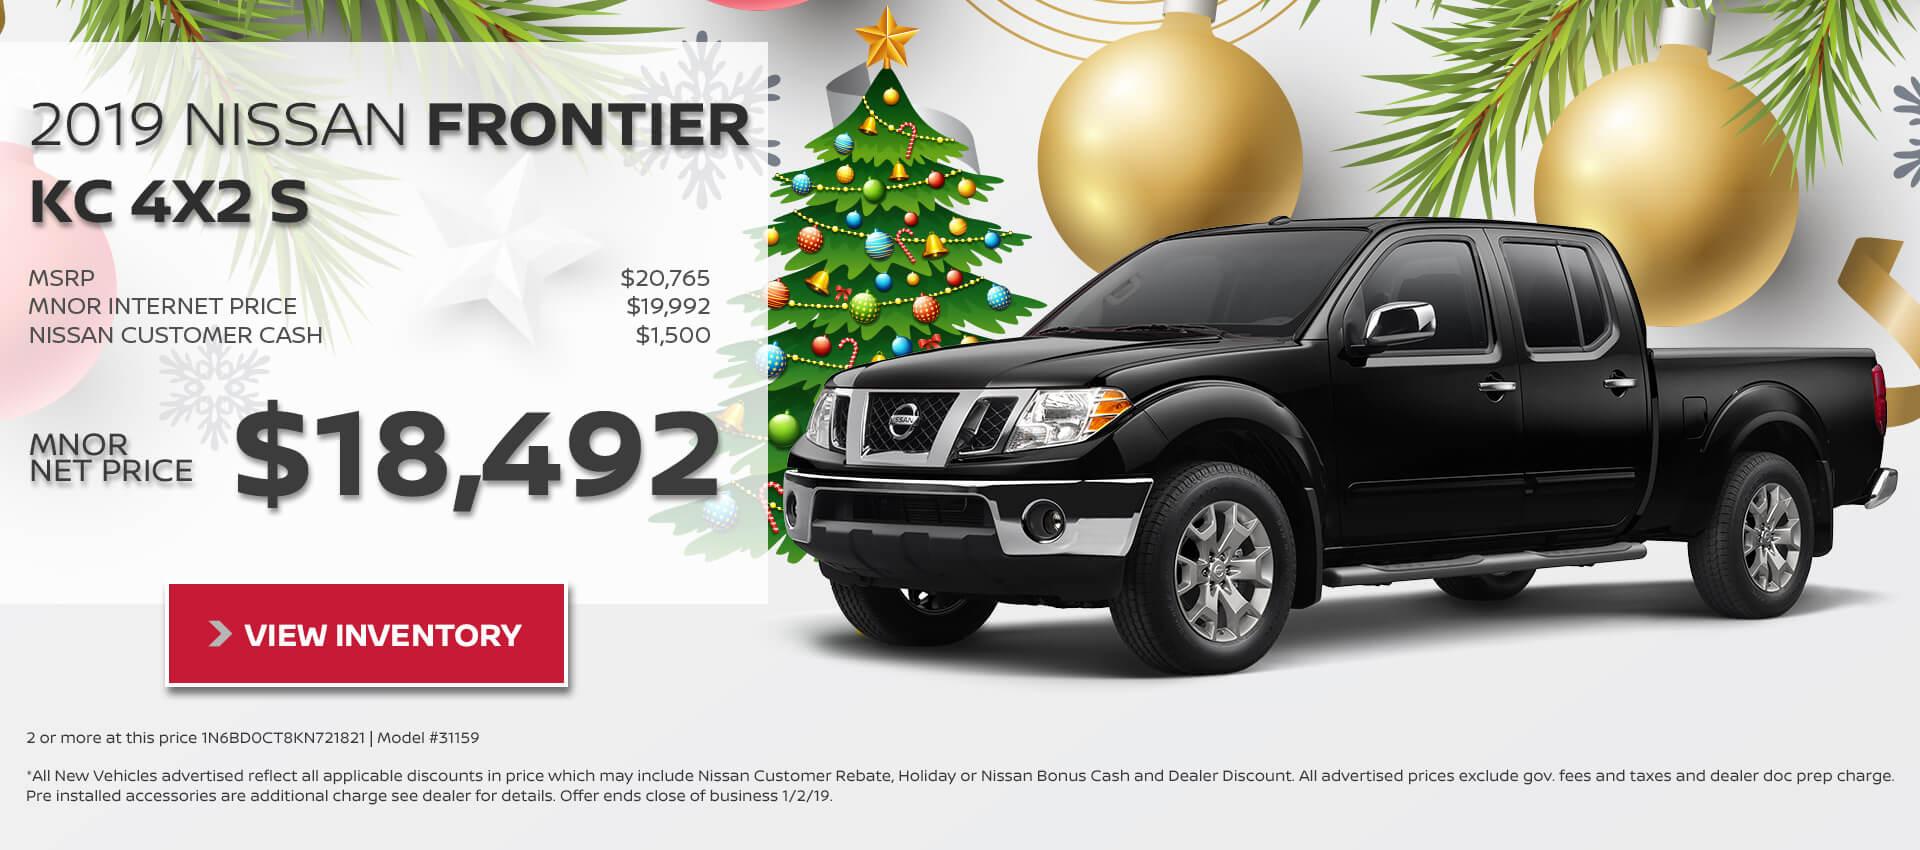 2019 Nissan Frontier KC $18,492